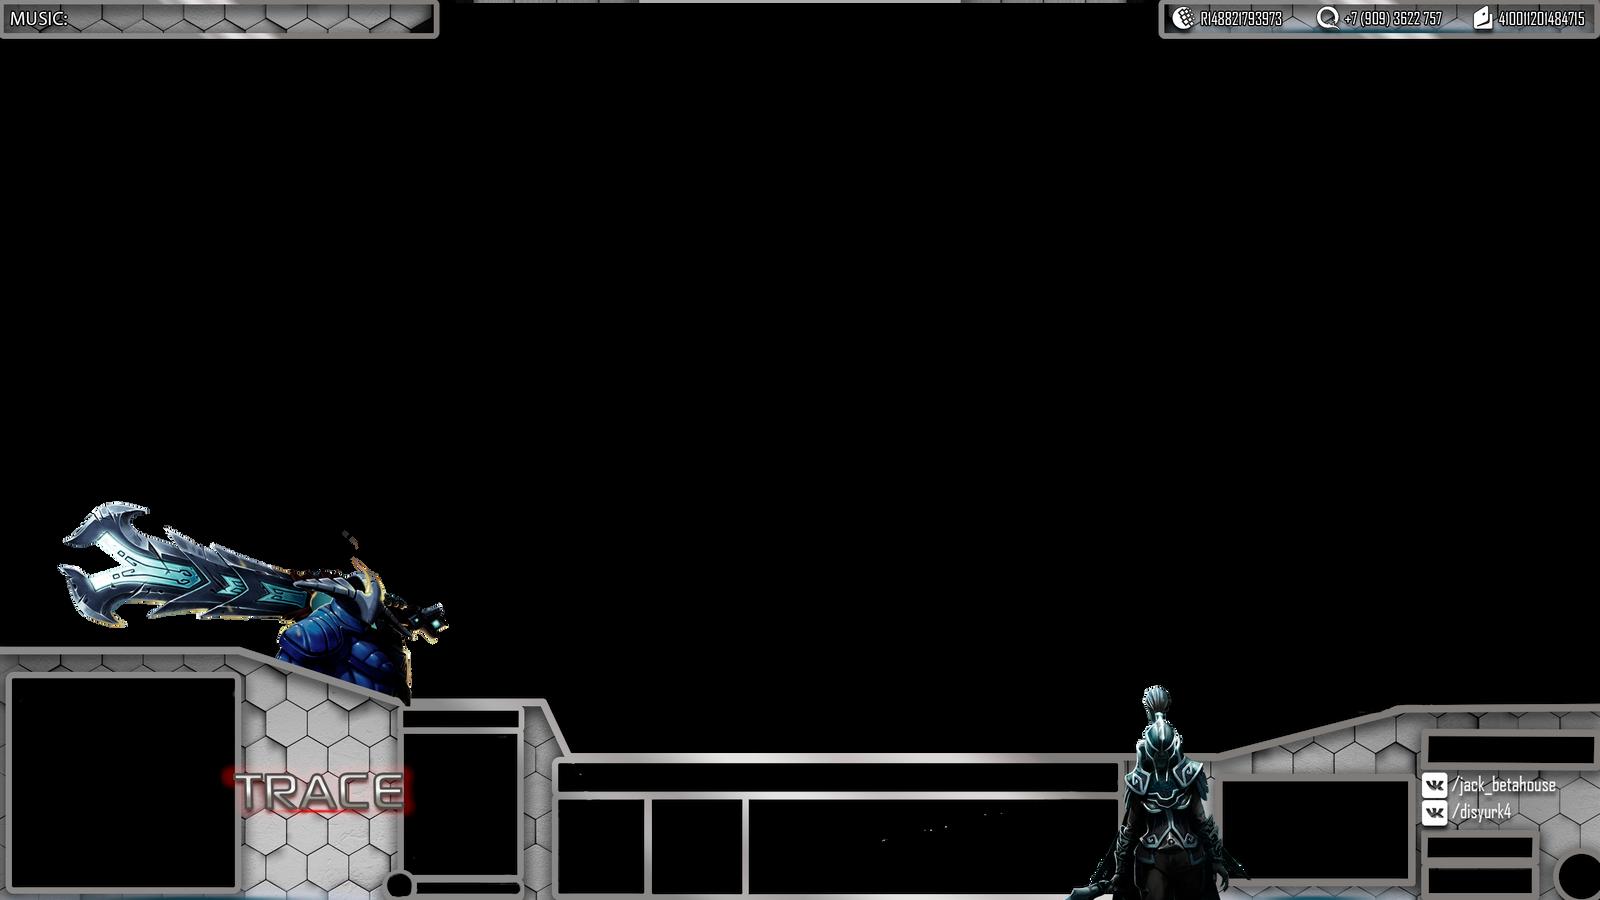 dota 2 custom hud overlay phantom assassin by yurk4 on deviantart